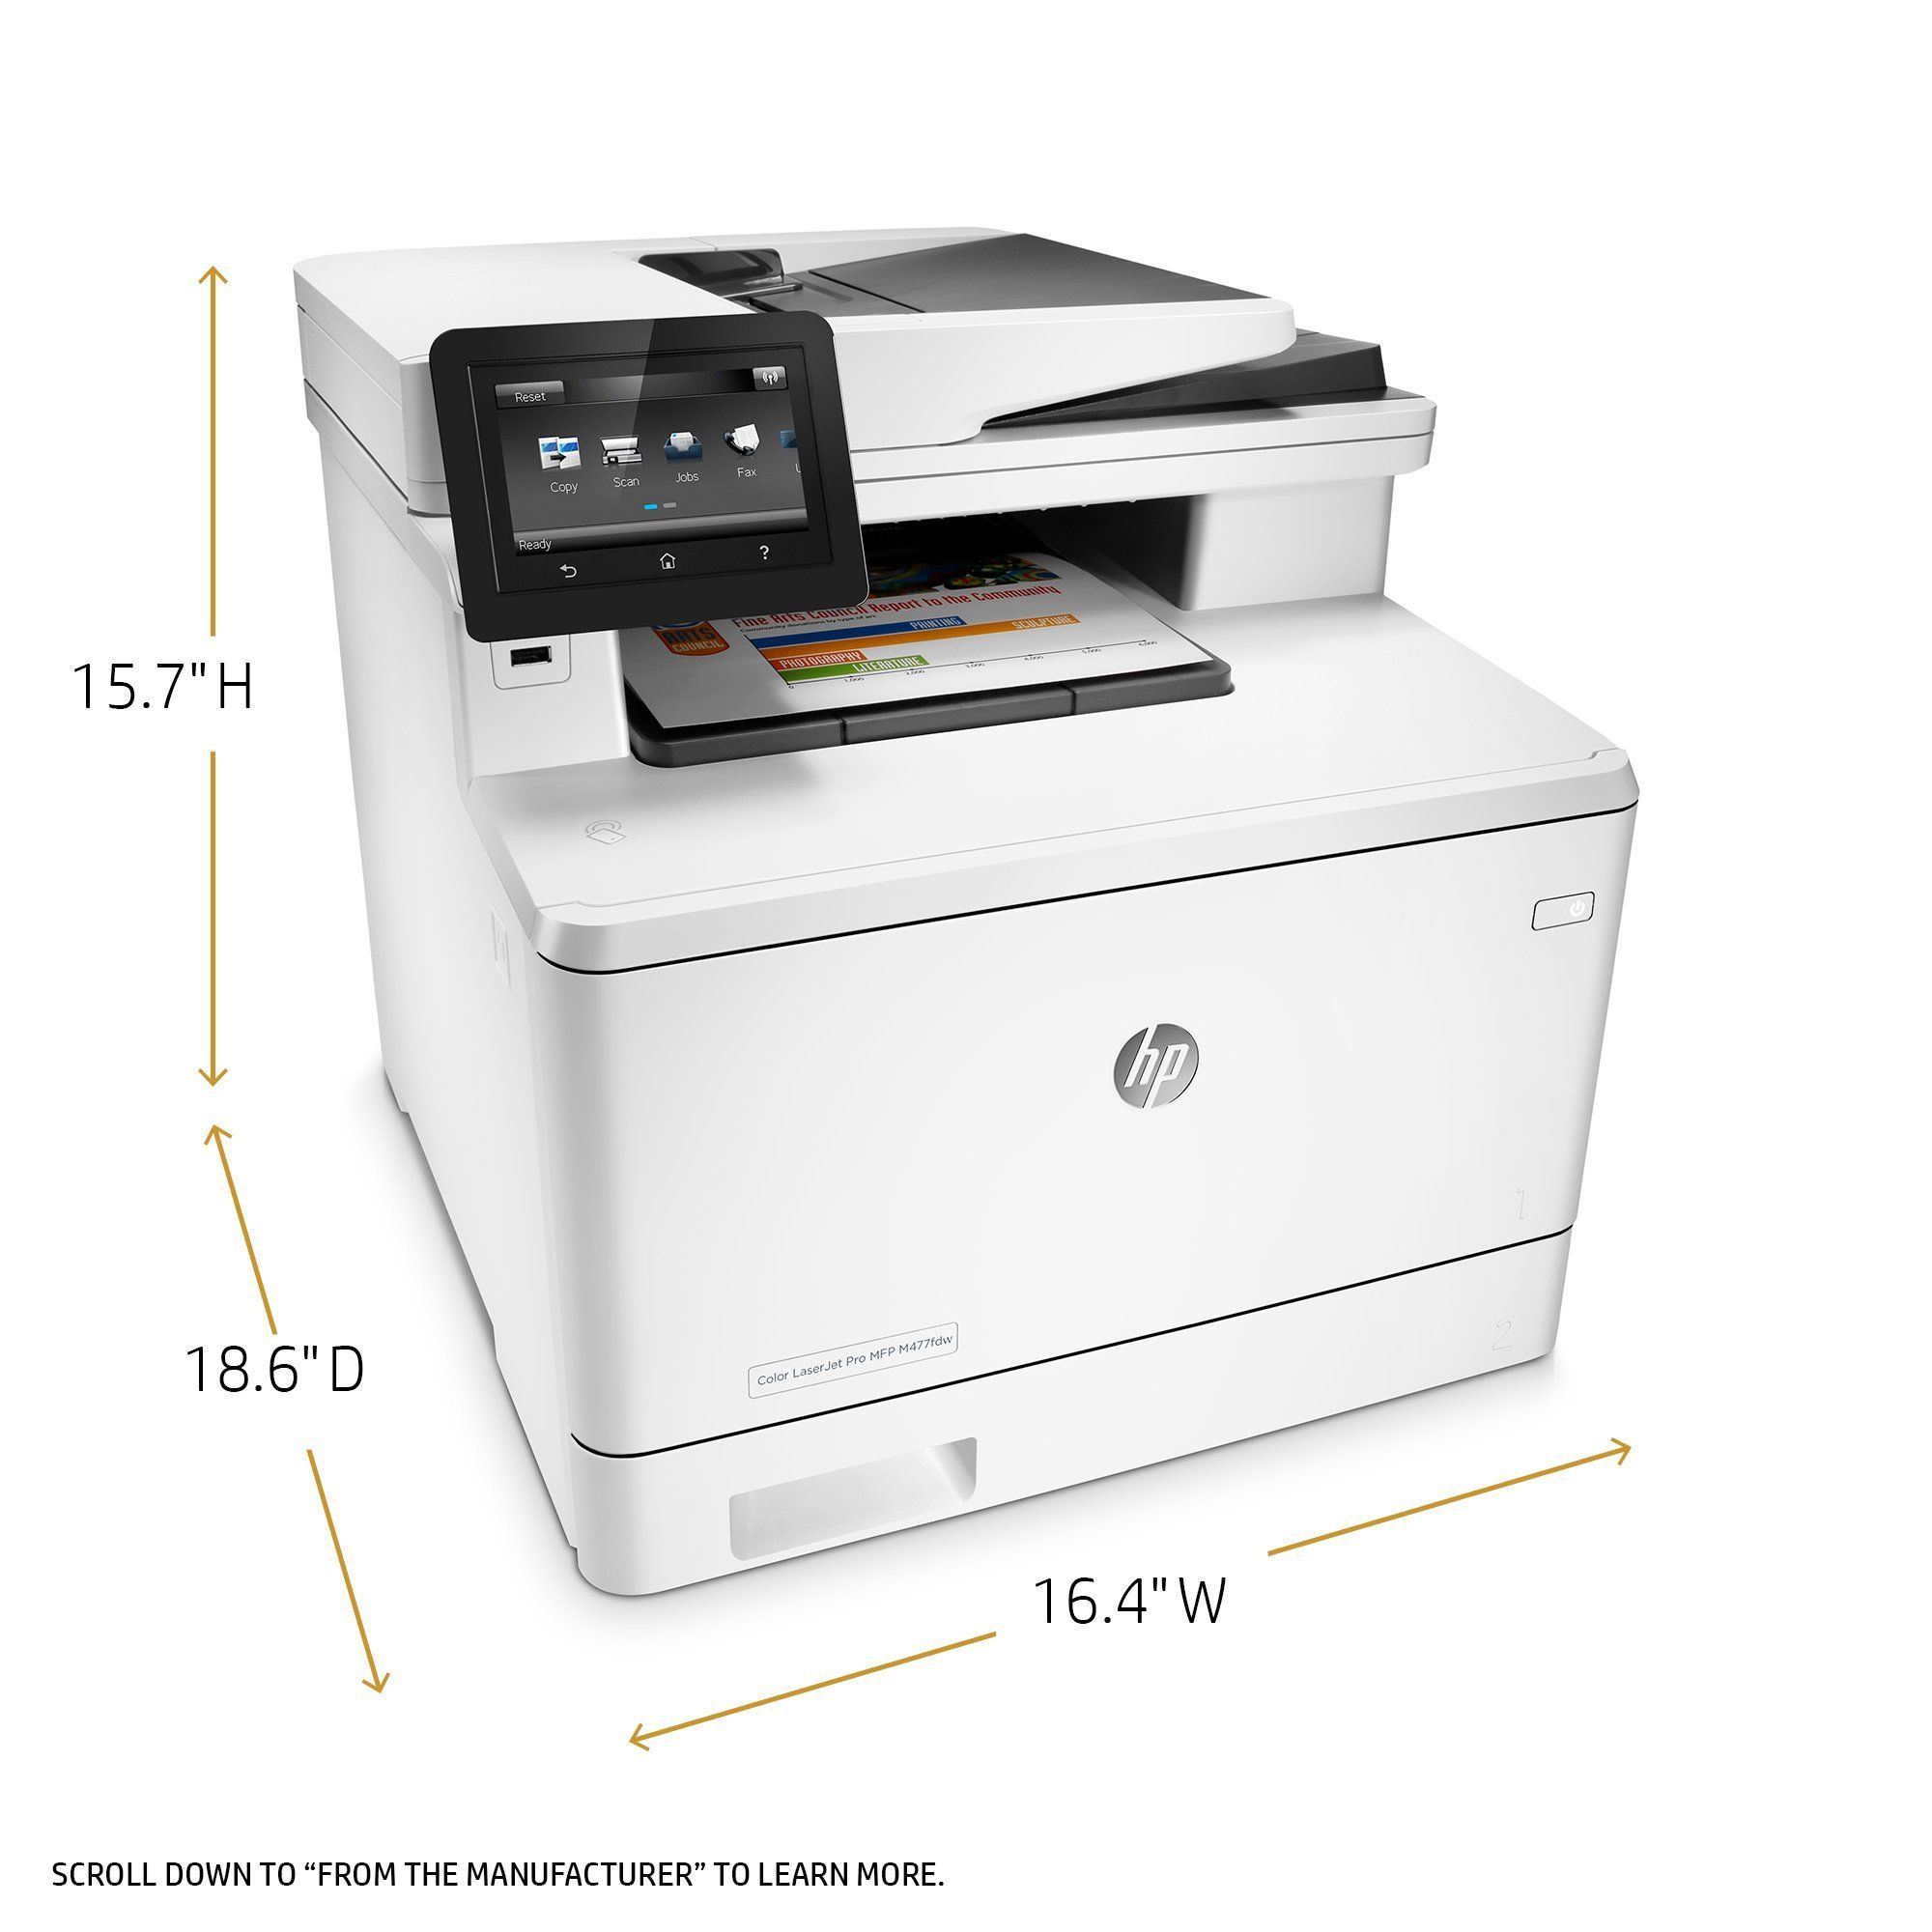 Hp Laserjet Pro M477fdw Multifunction Wireless Color Laser Printer With Duplex Printing Cf379a Certified Refurbished Vinyl Printer Printer Cutter Decal Printer